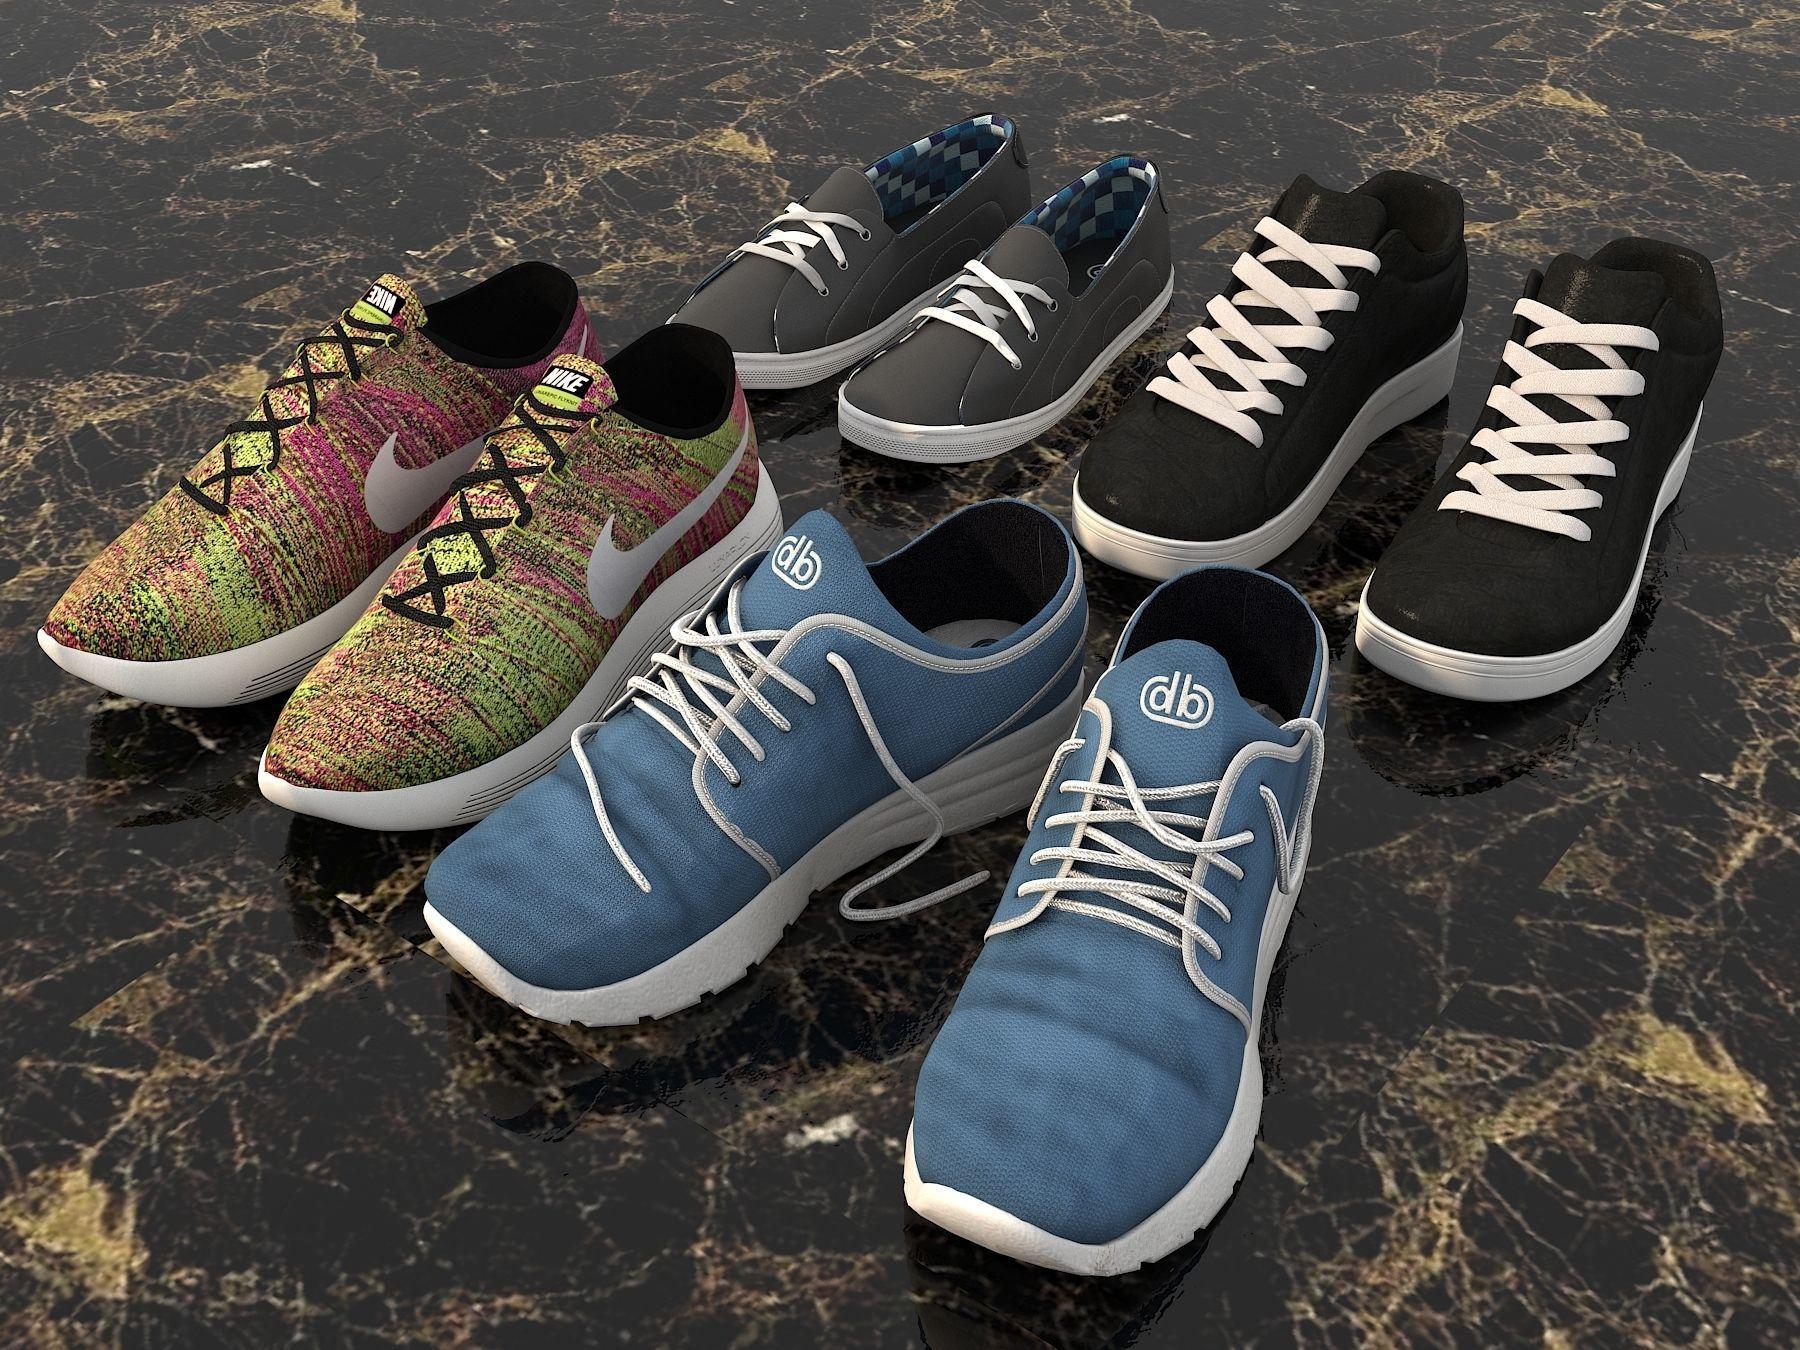 ... sport shoes collection set 3d model max obj mtl fbx 2 ... 83842476a